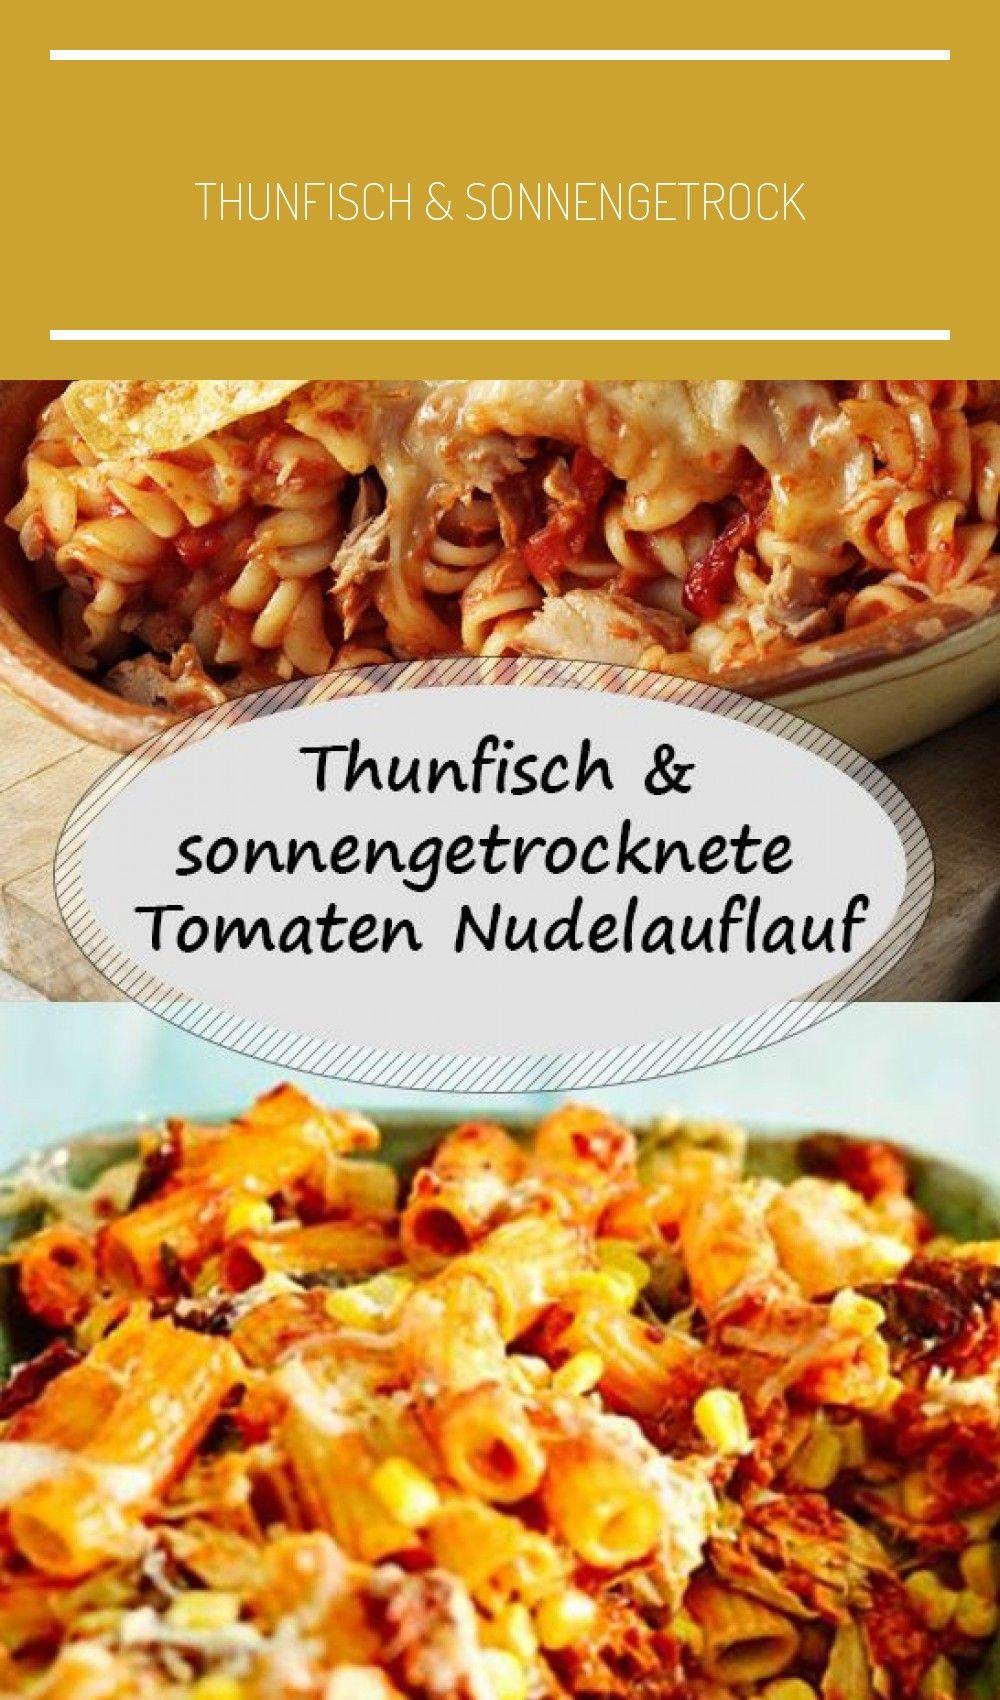 Thunfisch & sonnengetrocknete Tomaten Nudelauflauf #fitness food fish Thunfisch & sonnengetrocknete...